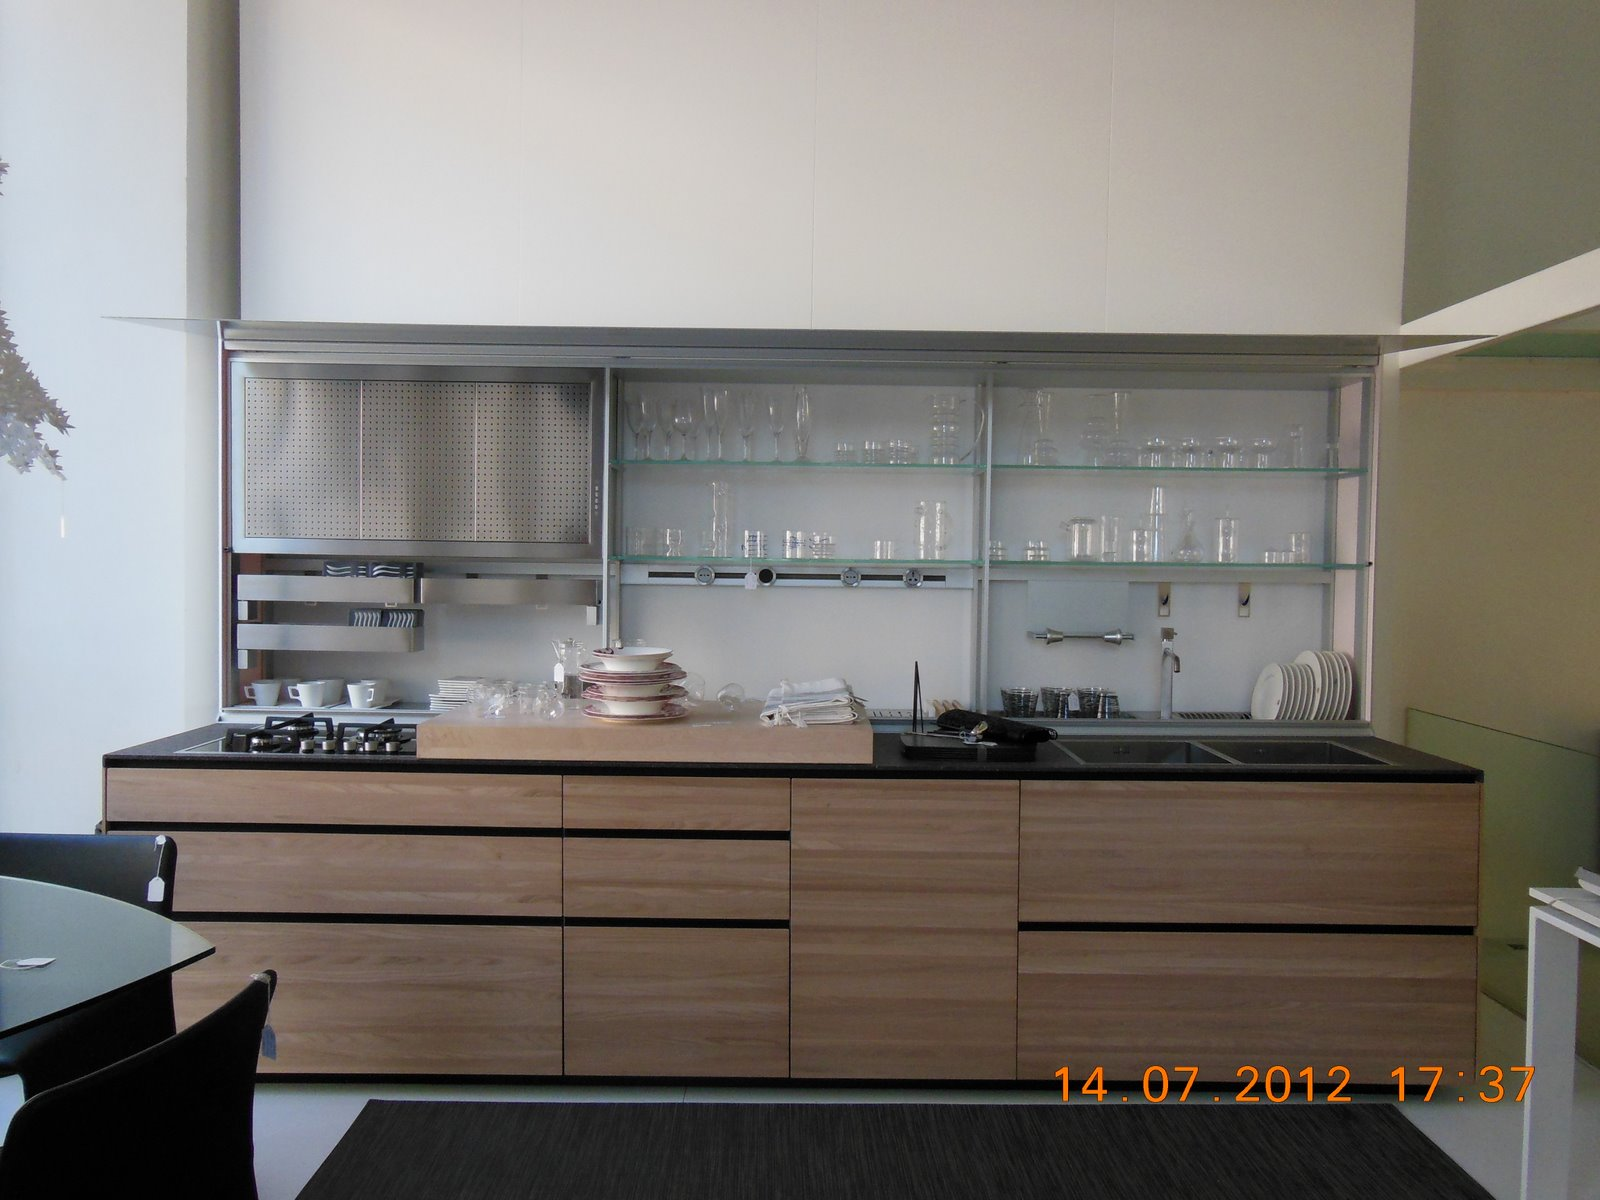 kitchen design hk. Italian Kitchen Design Interior Design For Hong Kong Homes